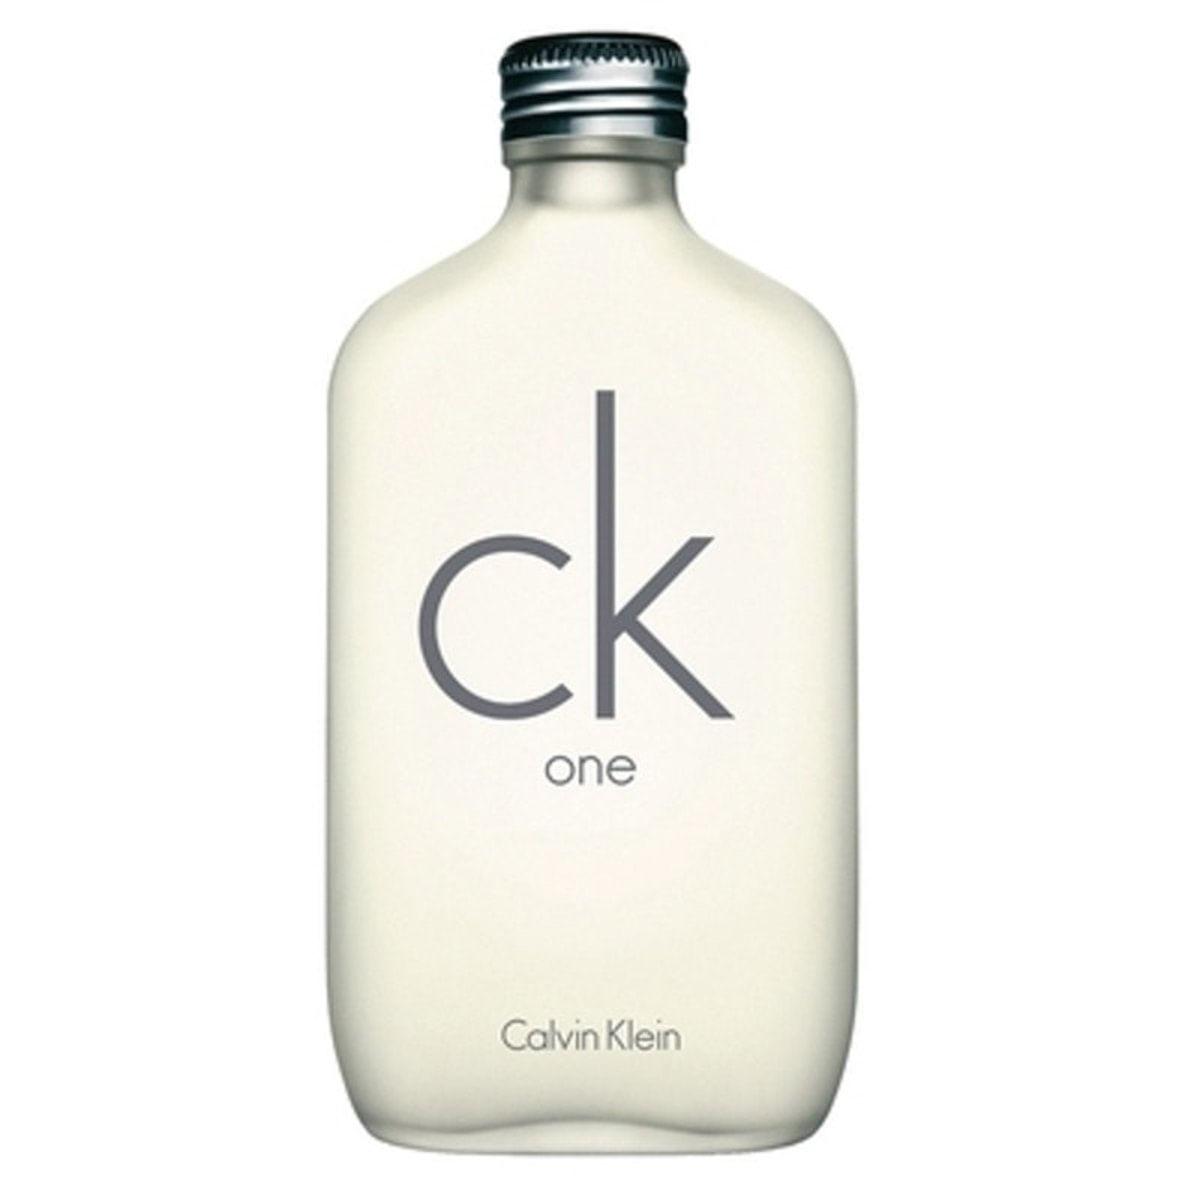 Imagem de Perfume Ck One Calvin Klein 100ml